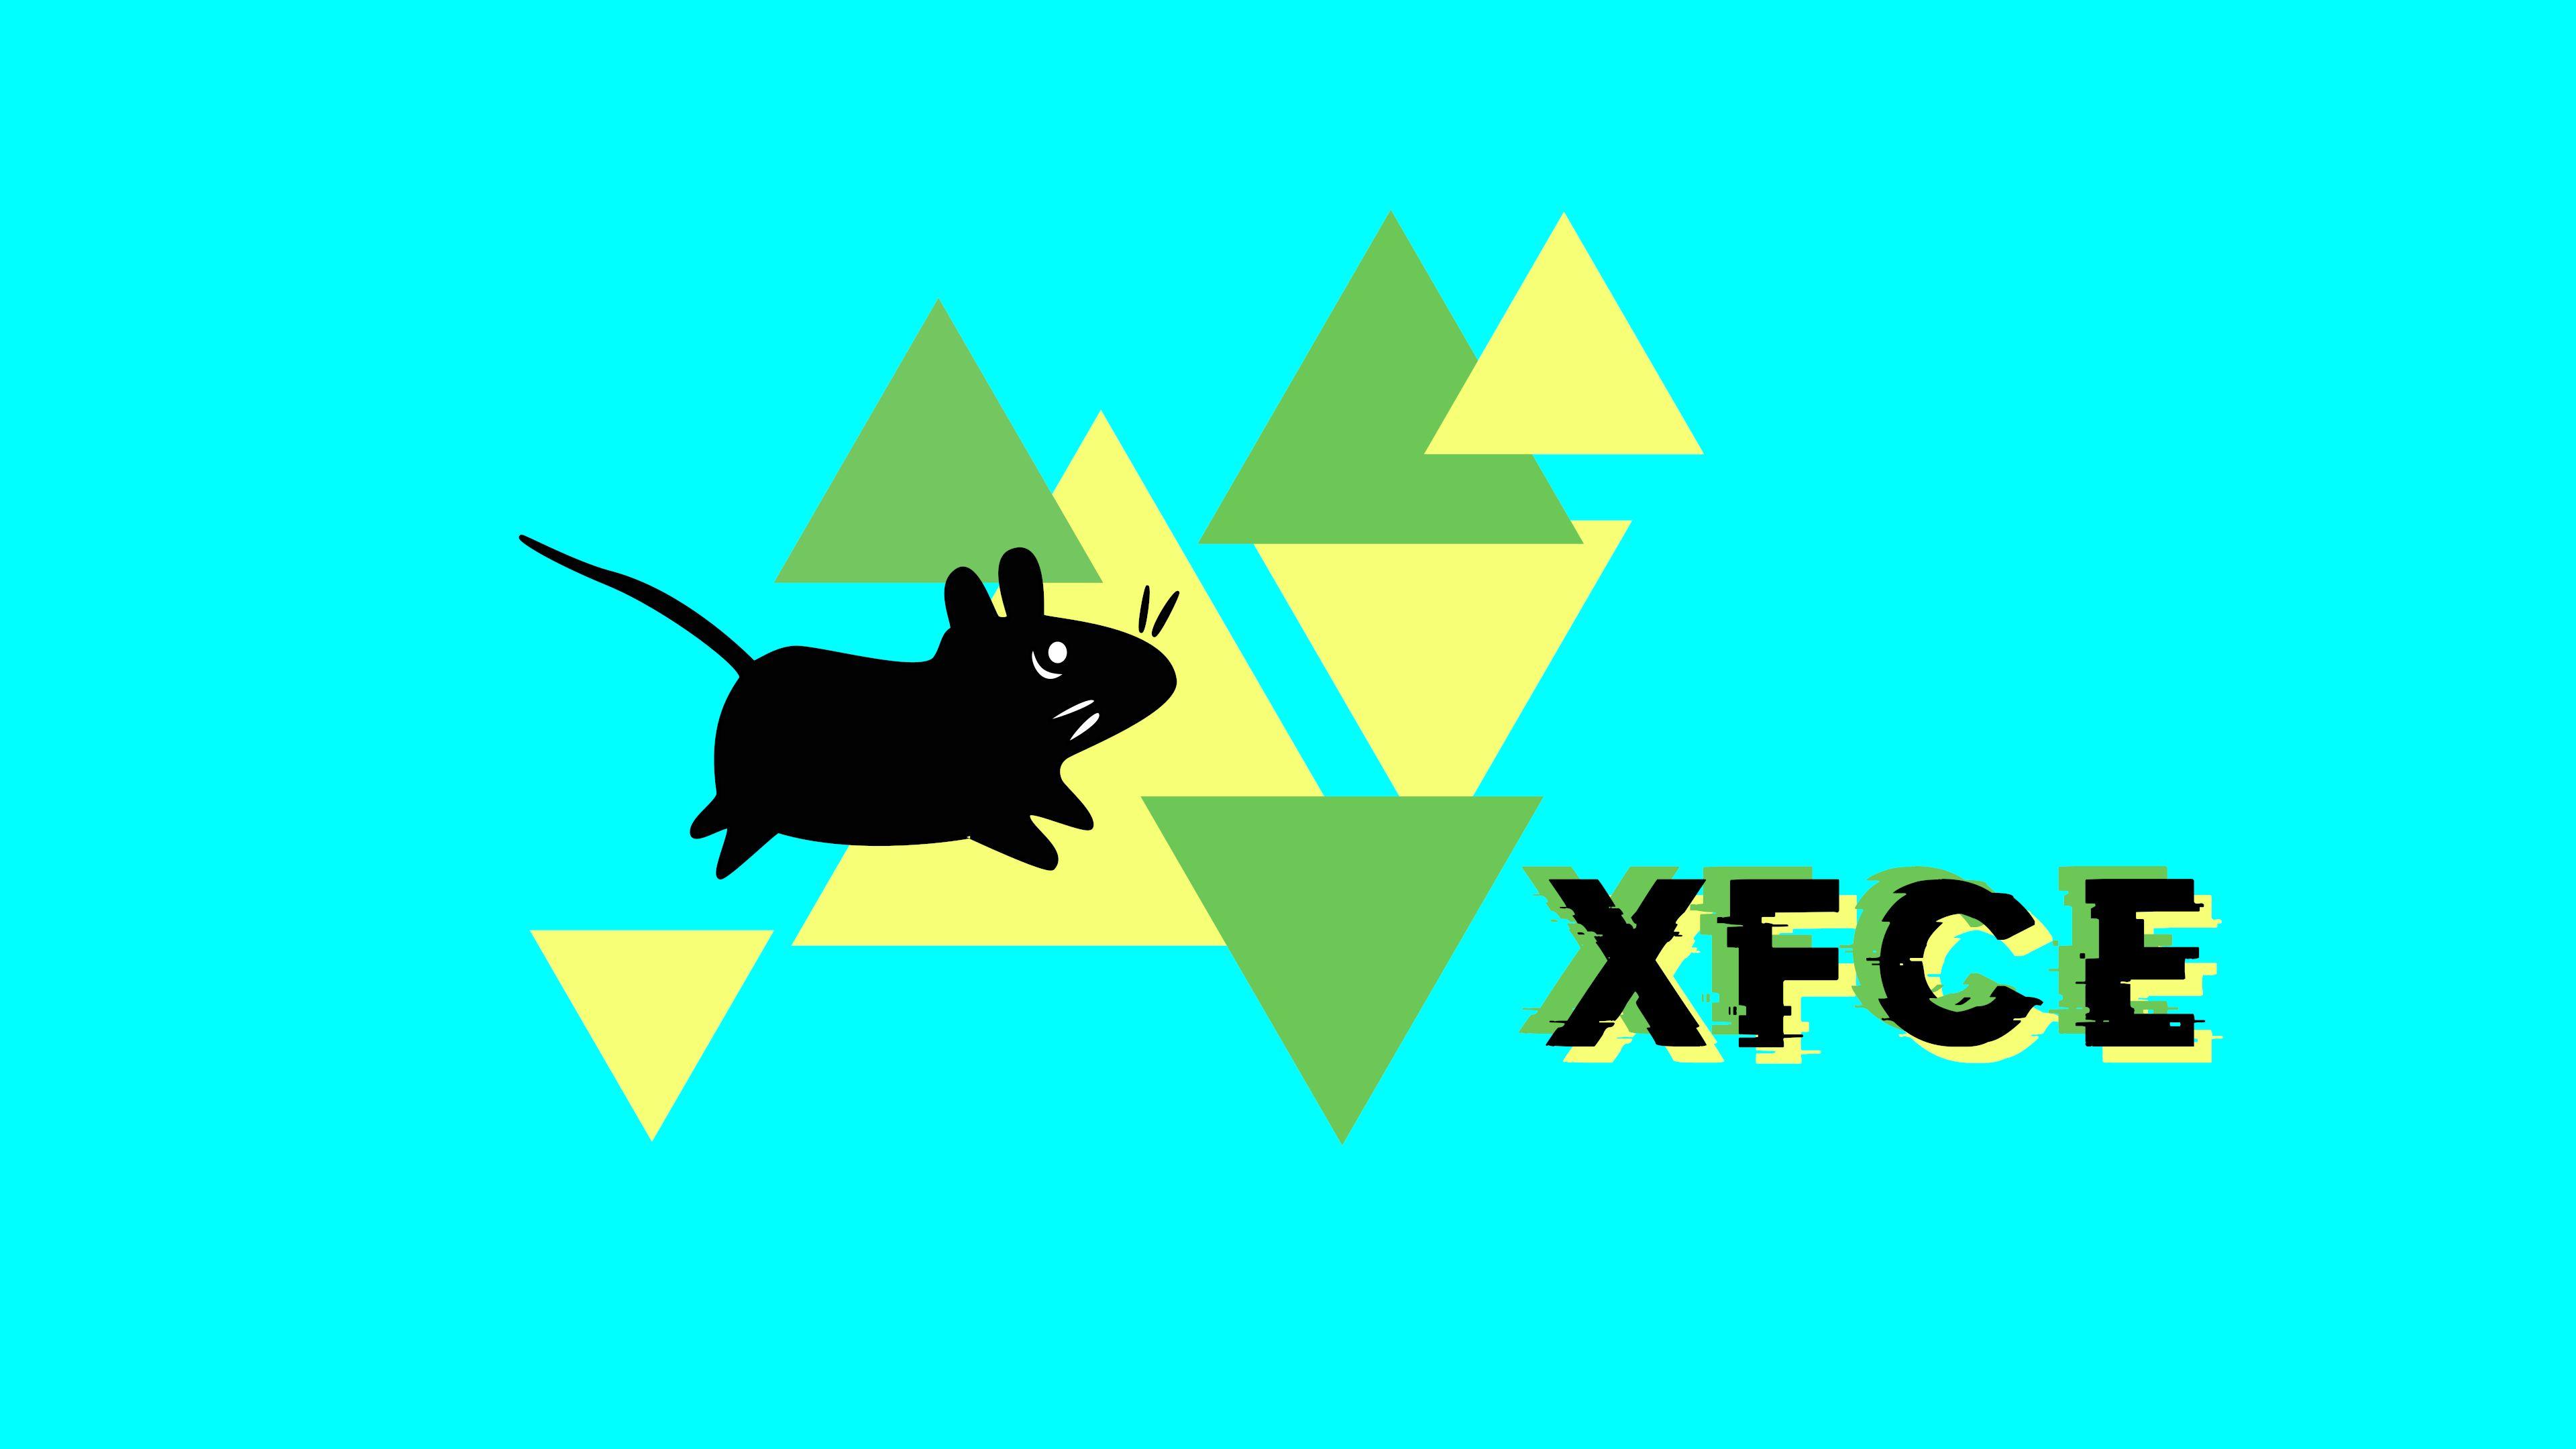 Xfce Flat